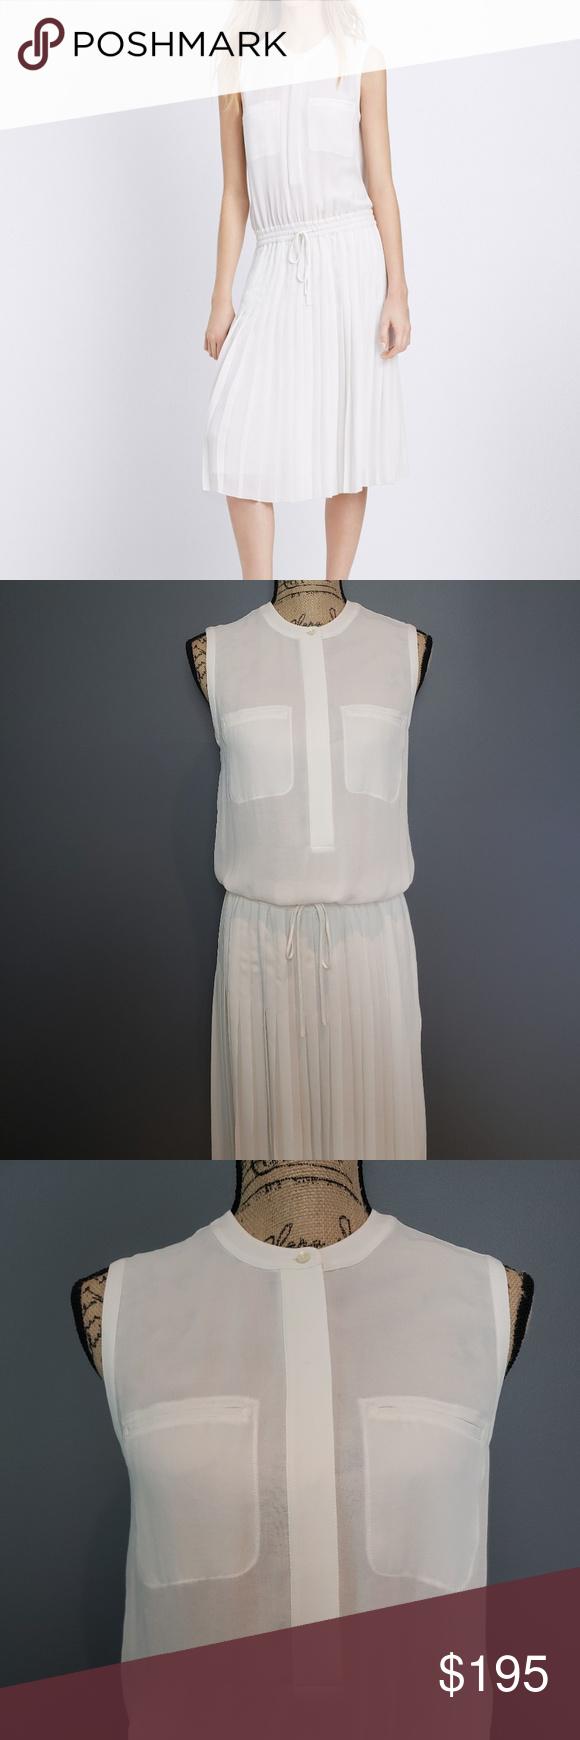 Vince Midi White Plated Dress Xs Gorgeous Dresses Dresses Dresses Xs [ 1740 x 580 Pixel ]